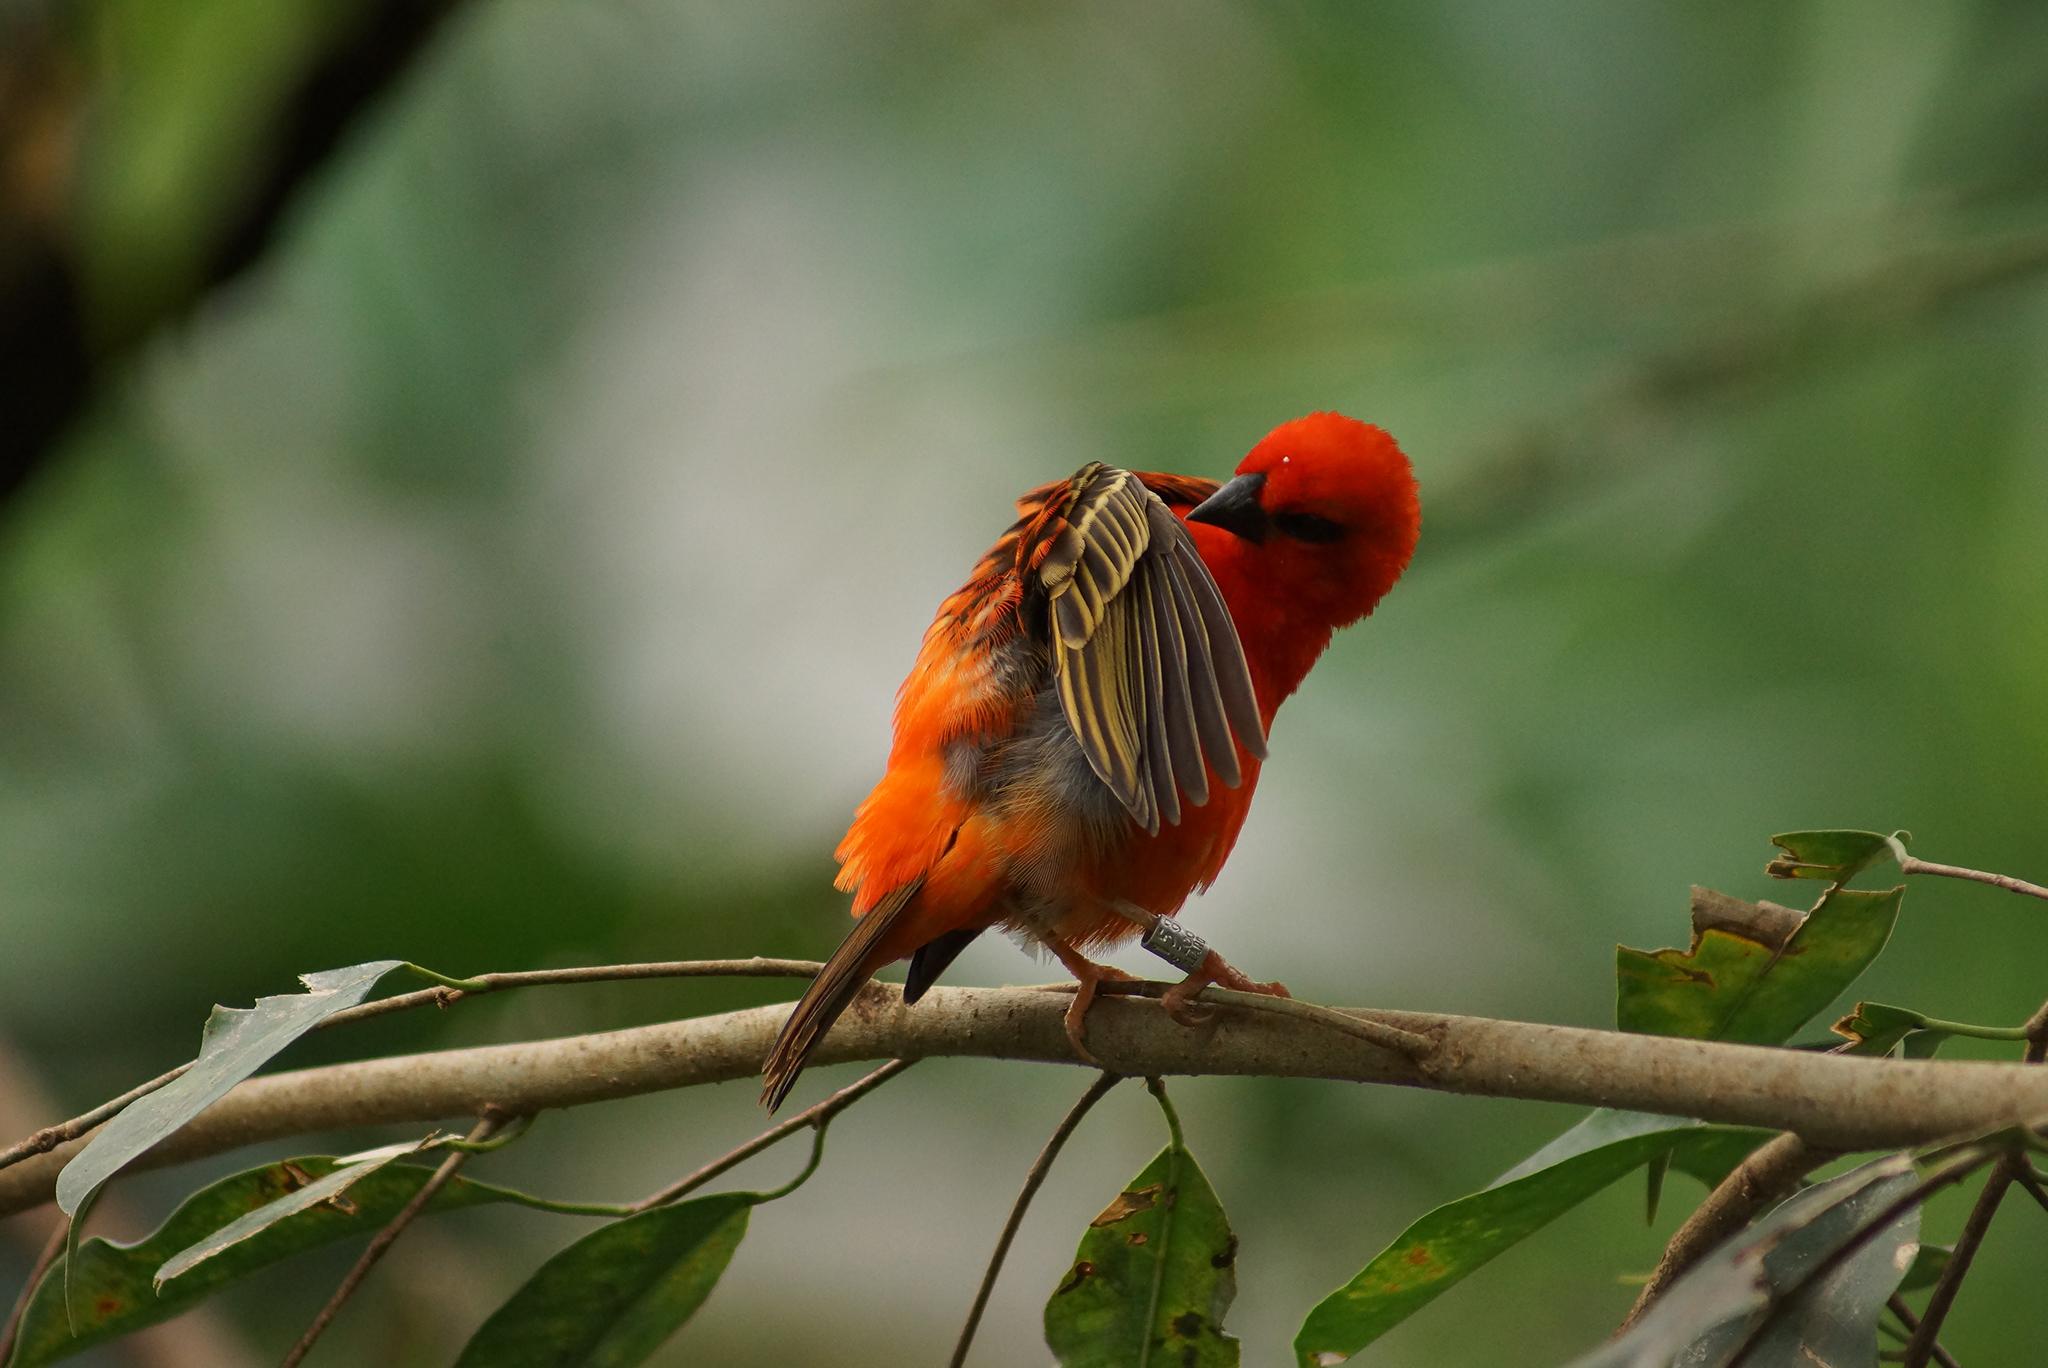 Photographie Faune, Animal, Oiseau